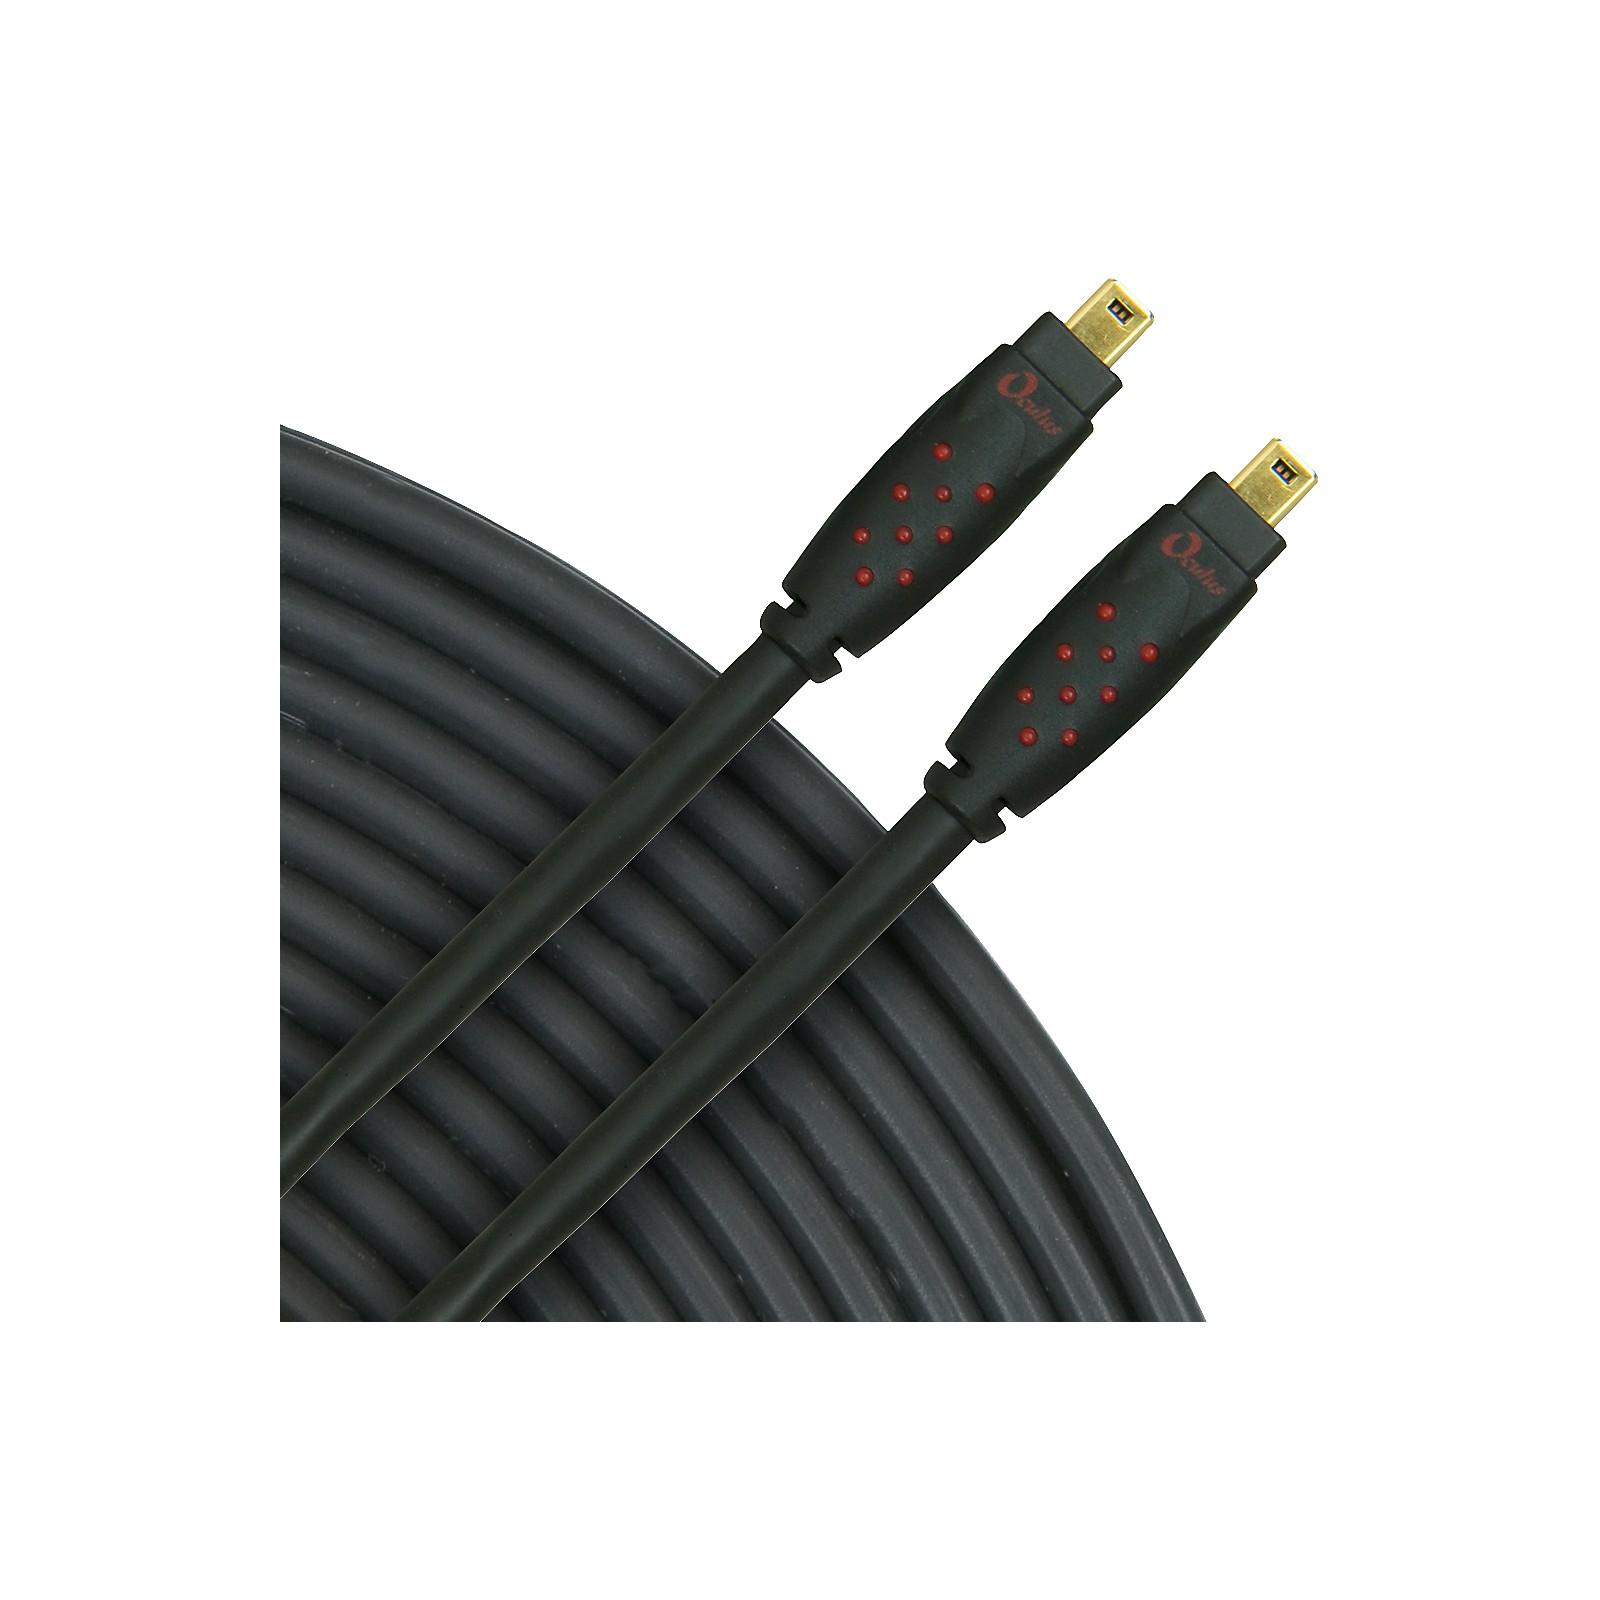 Open Box Rapco Horizon Oculus 4-Pin to 4-Pin Firewire Cable, Series 8